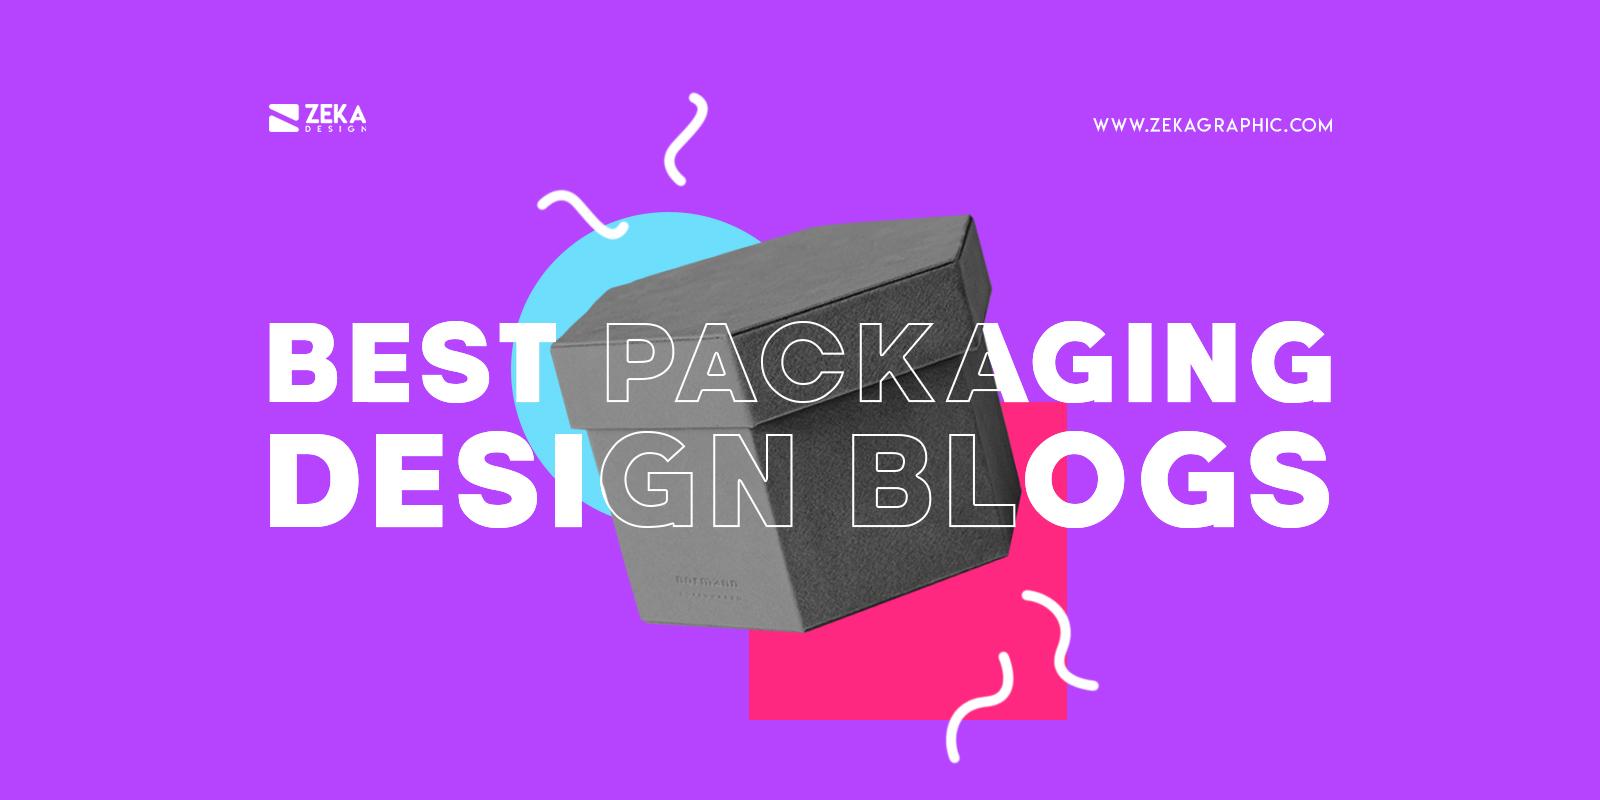 Best Packaging Design Blogs For Inspiration